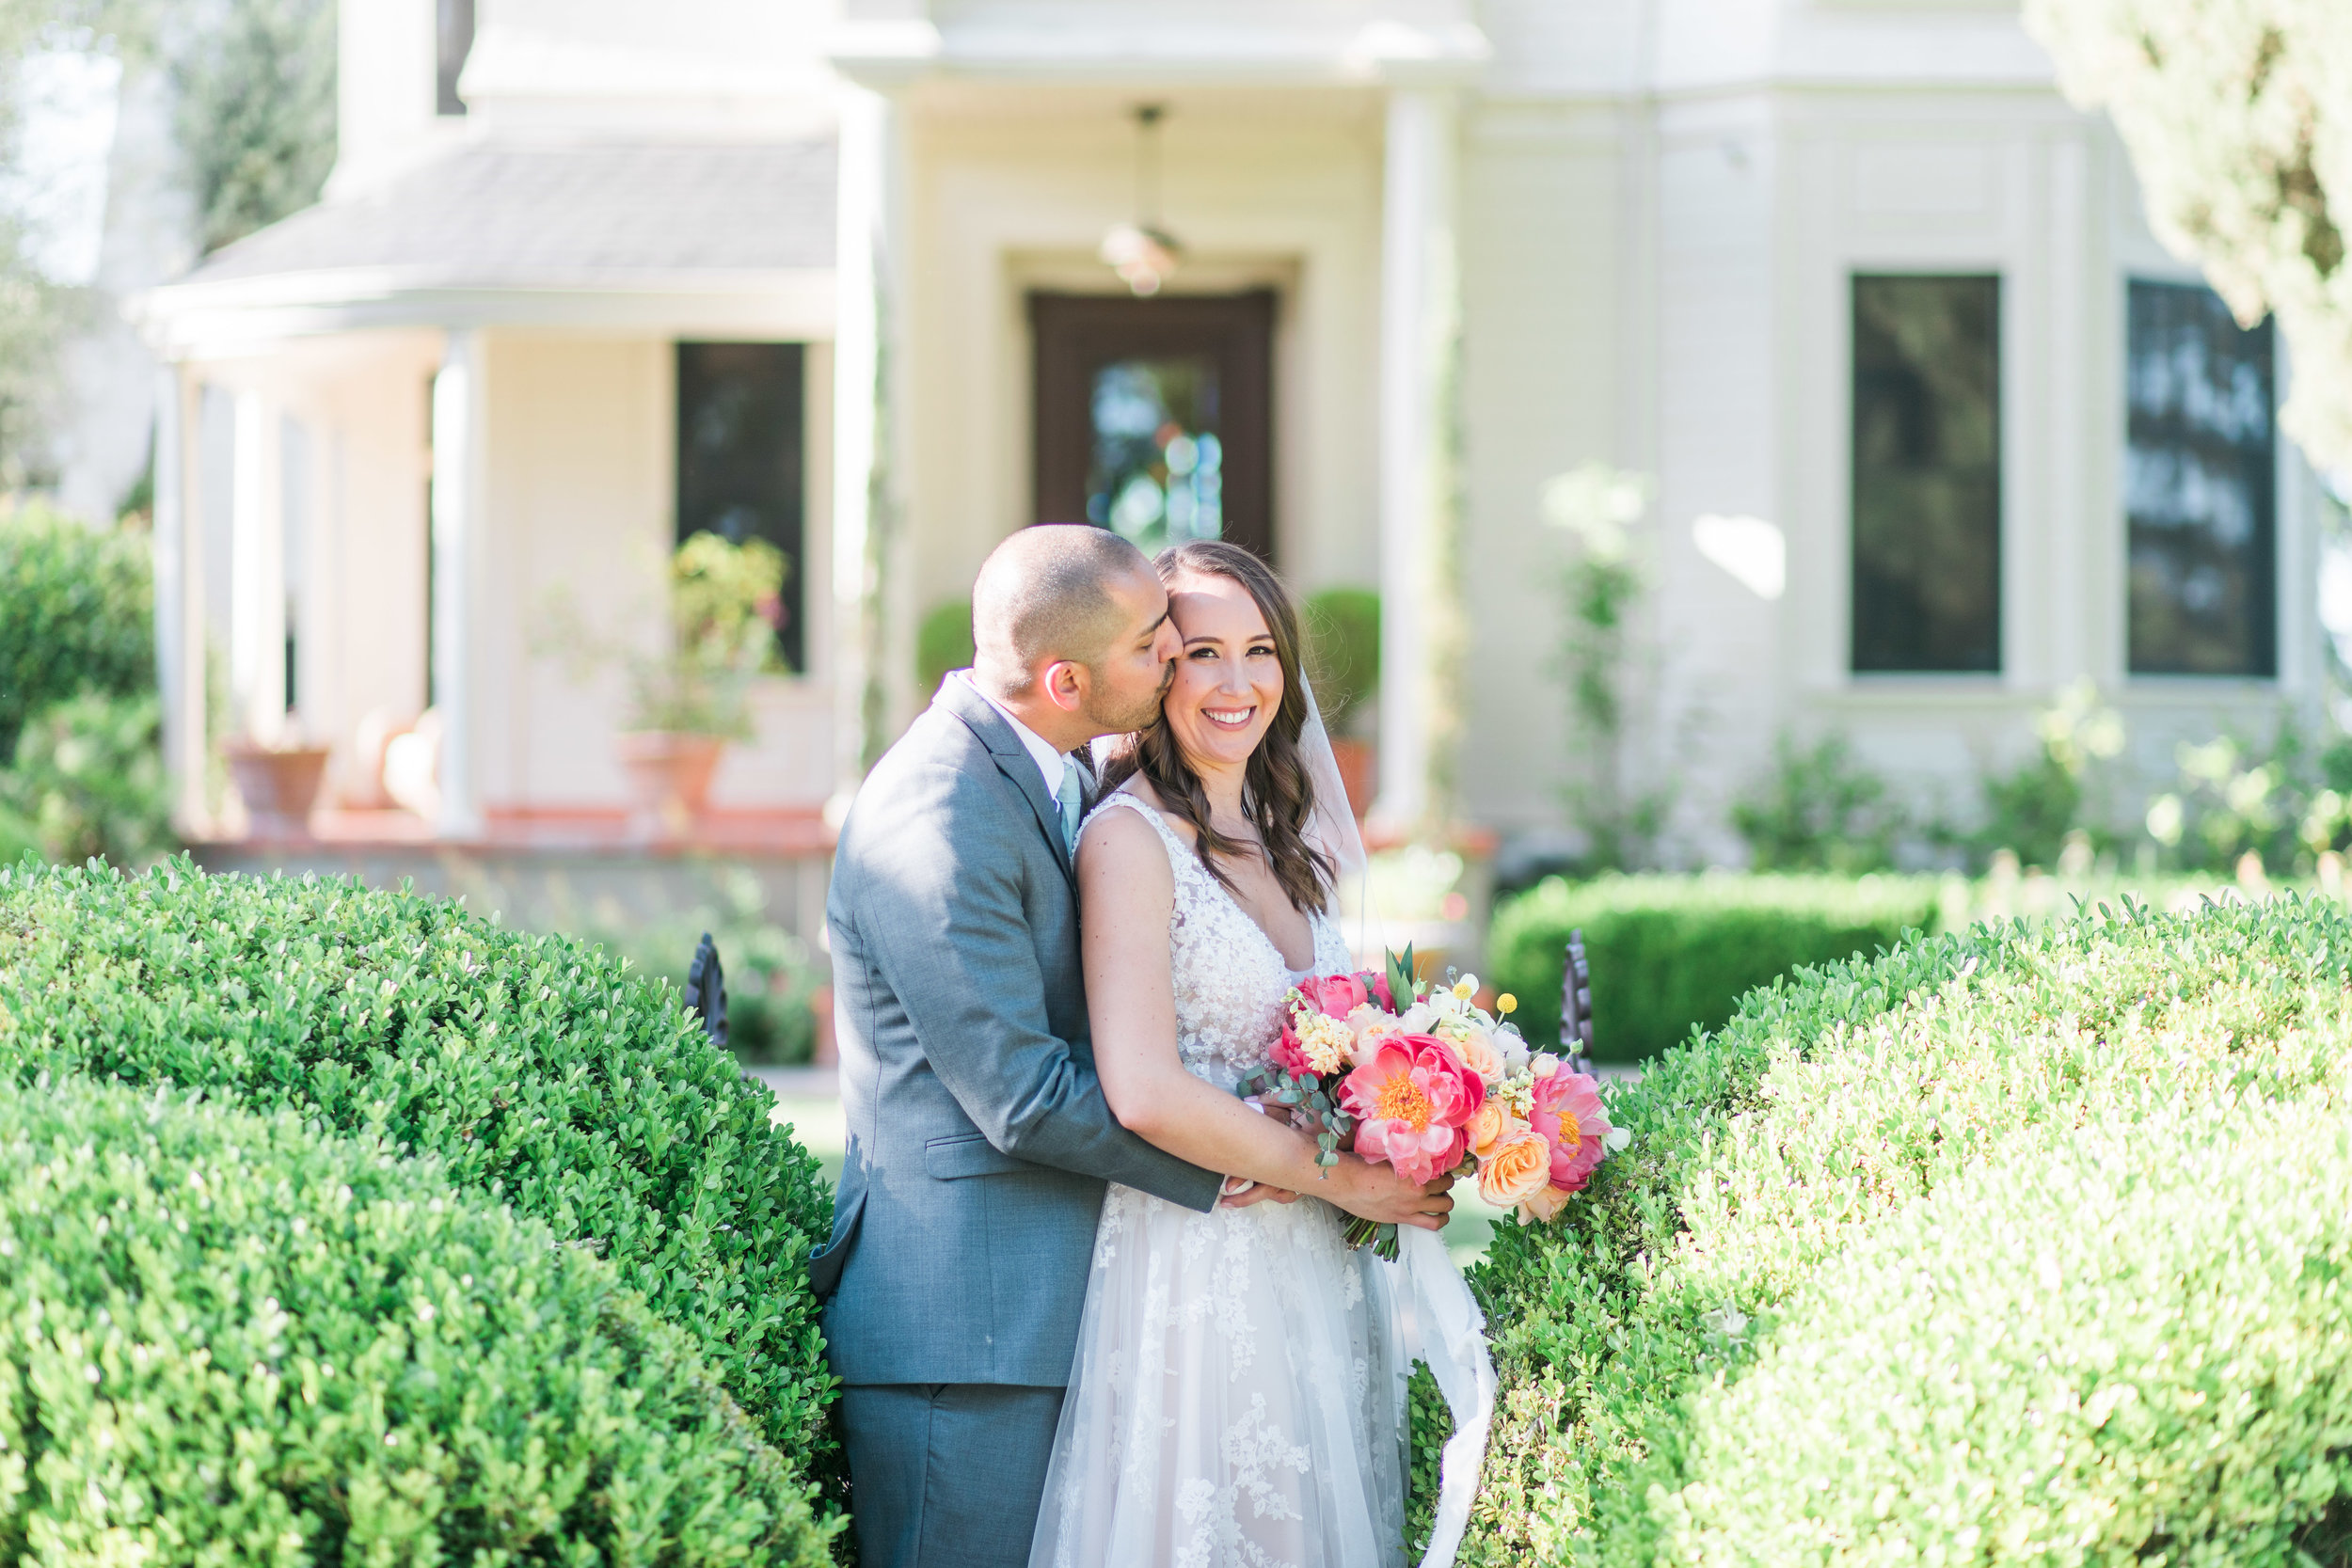 Tess-Jesse-Wedding-SP-by-JBJ-Pictures-15.jpg